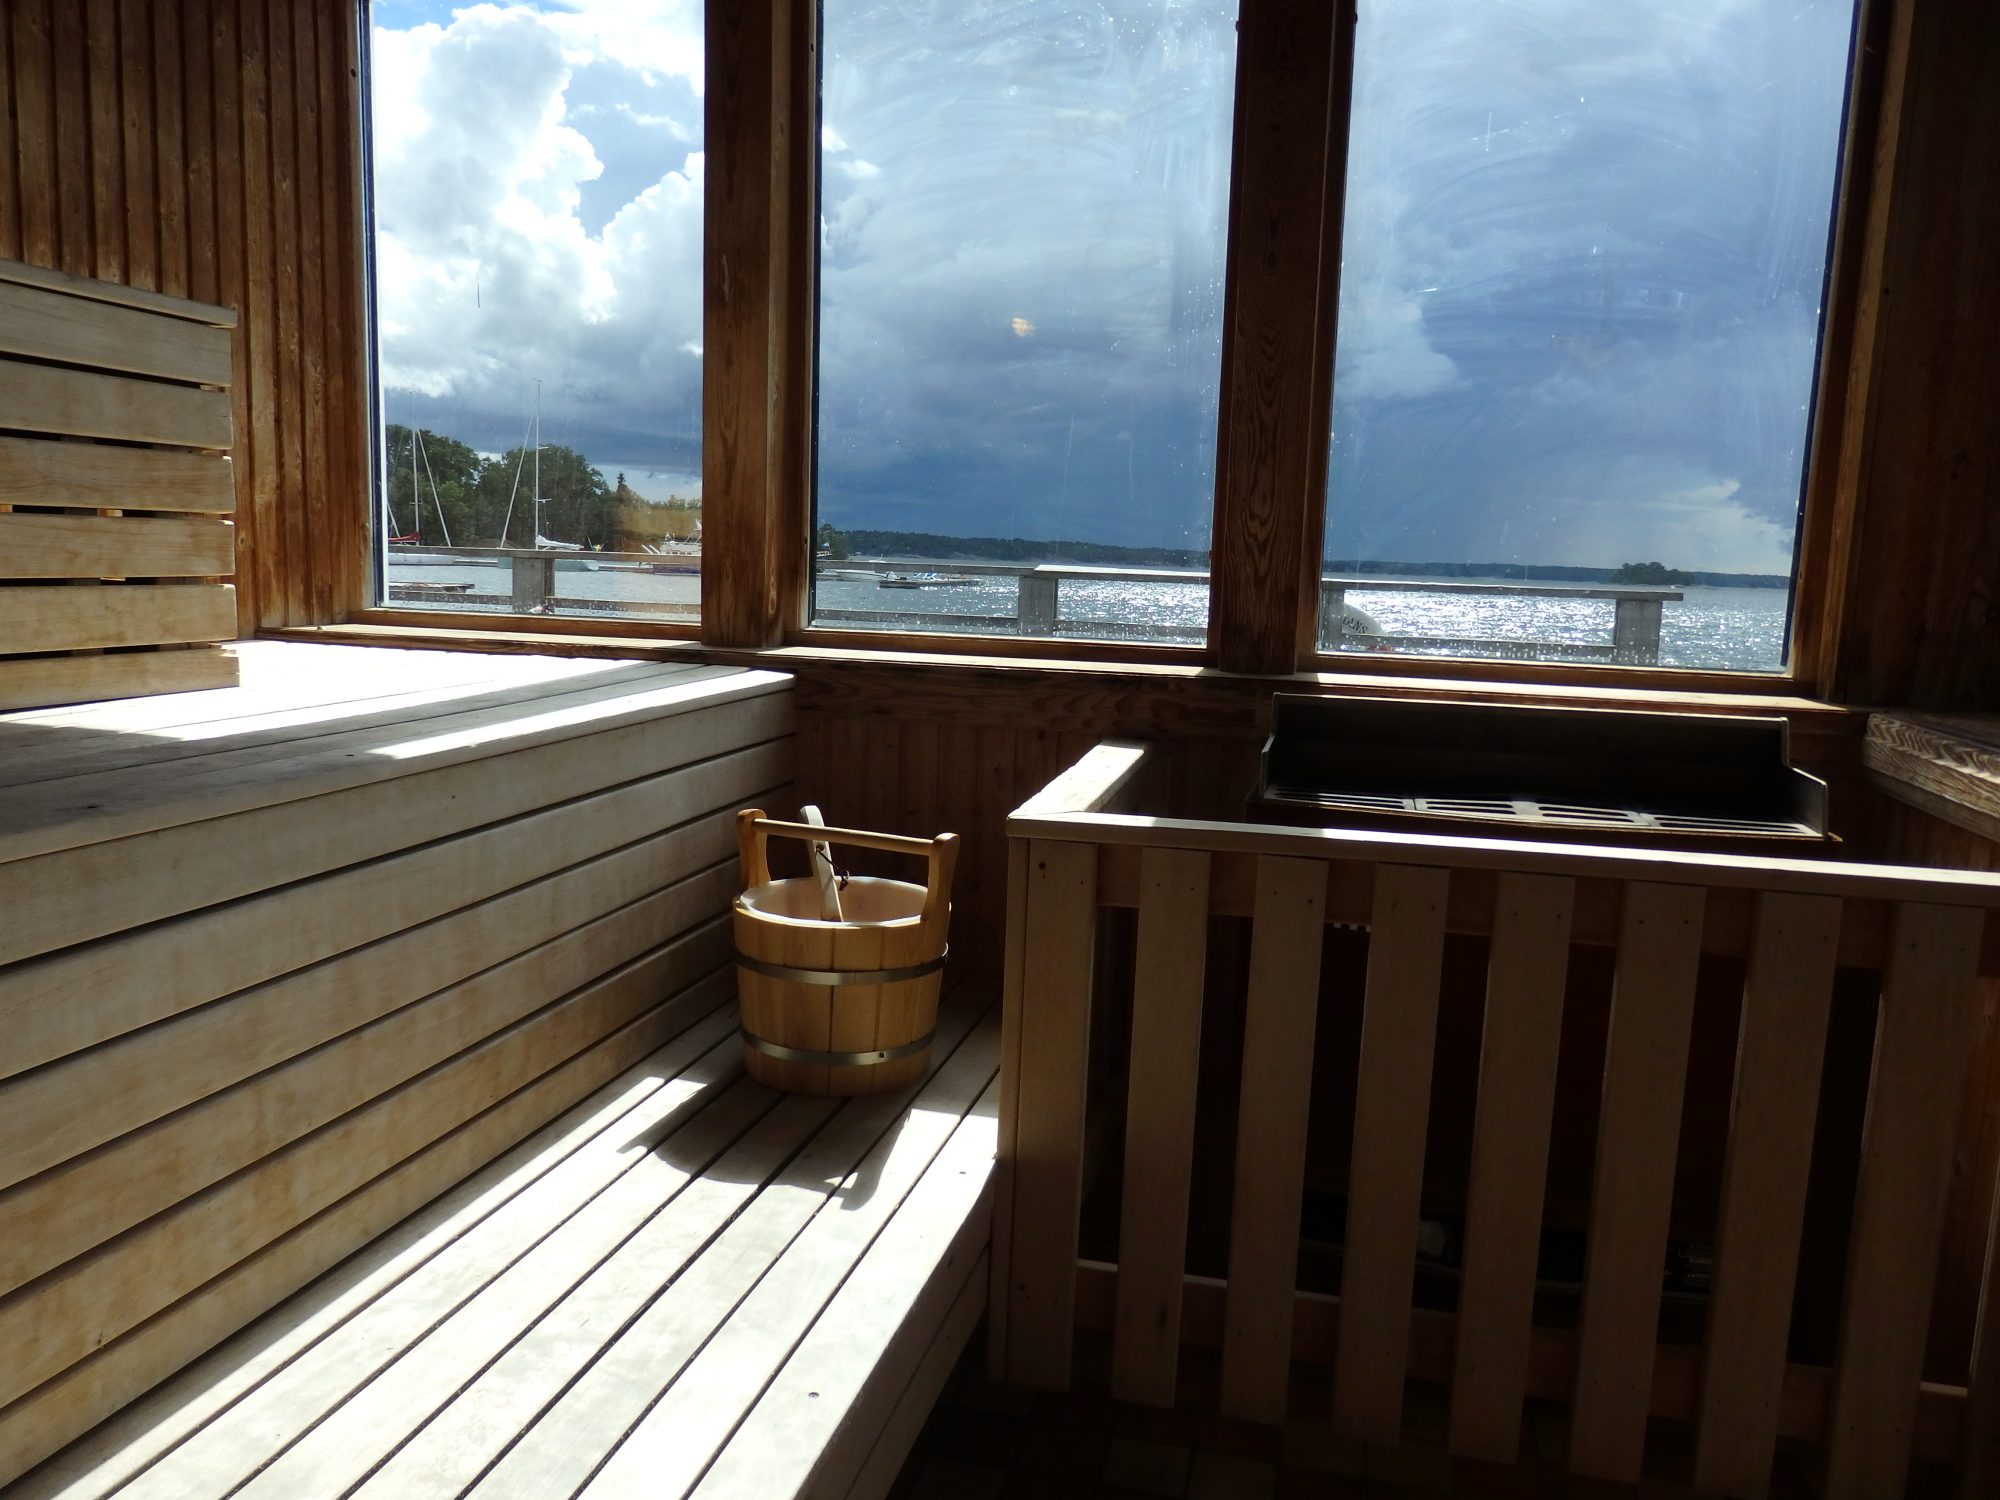 sauna with a view on Nasslingen Island, Sweden